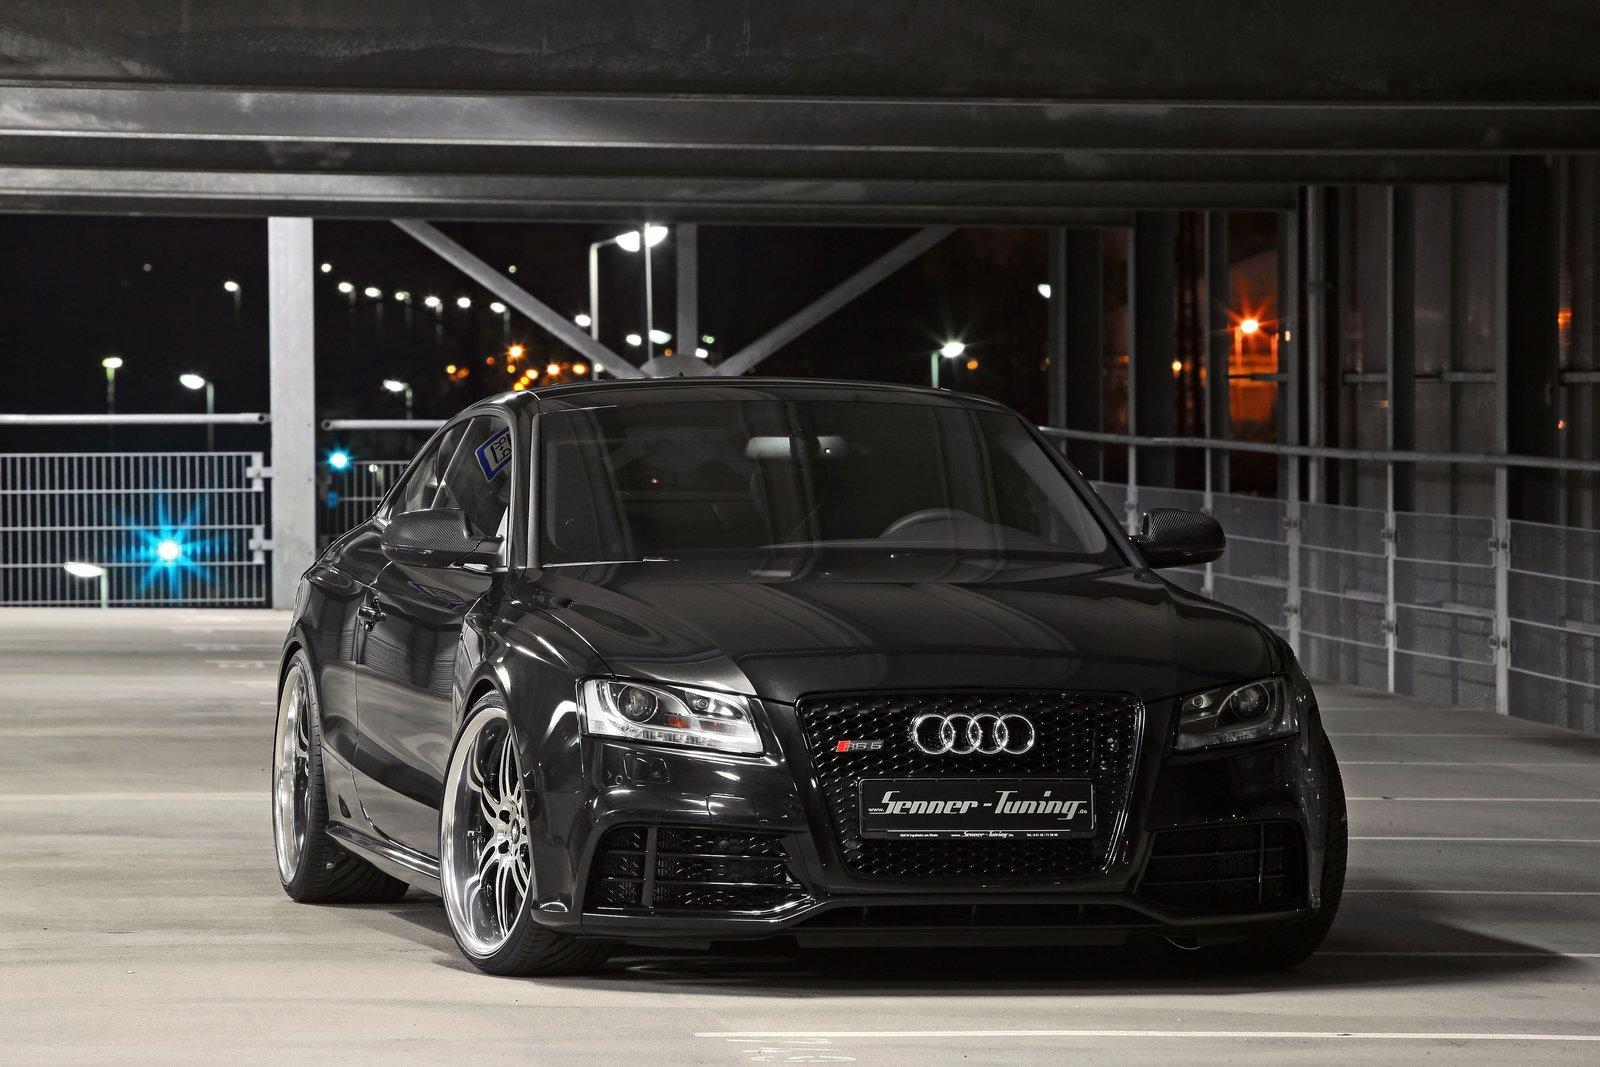 New Audi S5 >> Senner Tuning Audi RS5